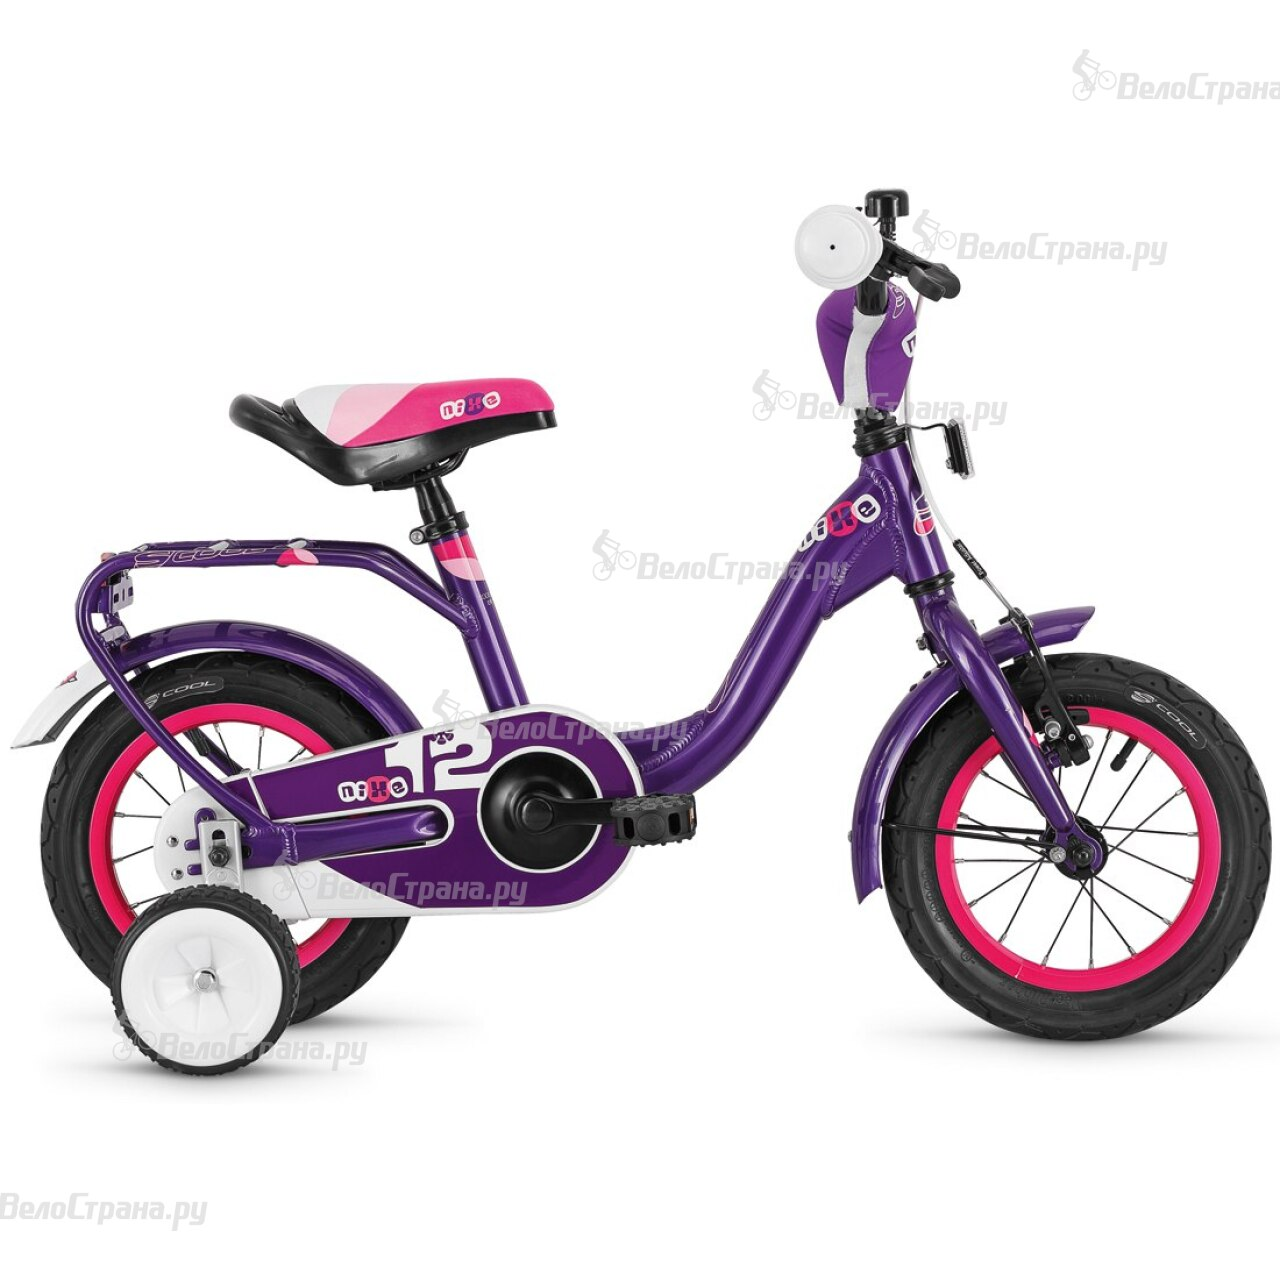 Велосипед Scool niXe 12 (2015)  недорого